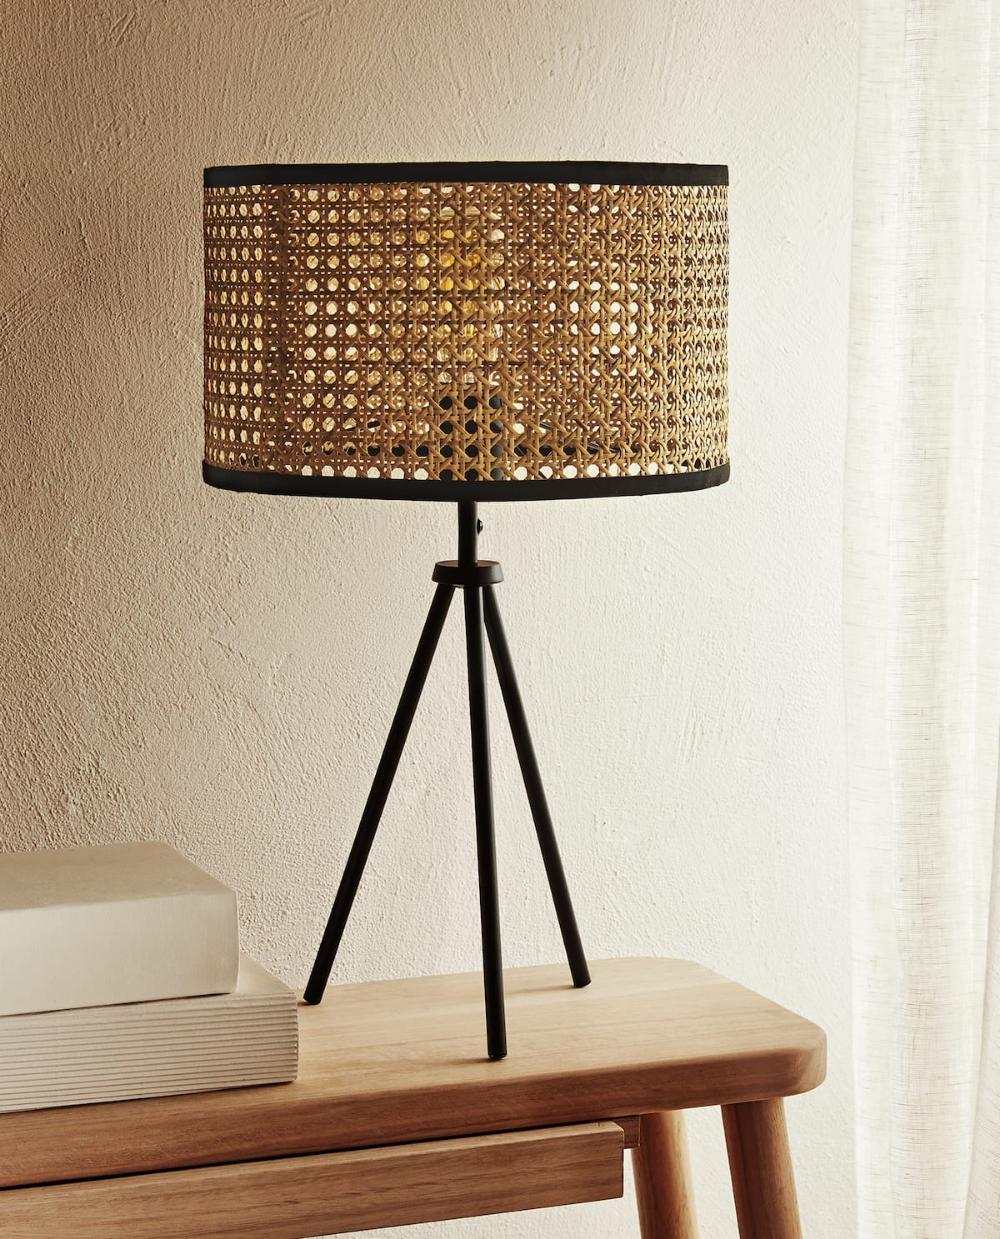 Afbeelding 7 Van Het Product Lamp Rotan Belysning Vardagsrum Lampor Vardagsrum Dekorera